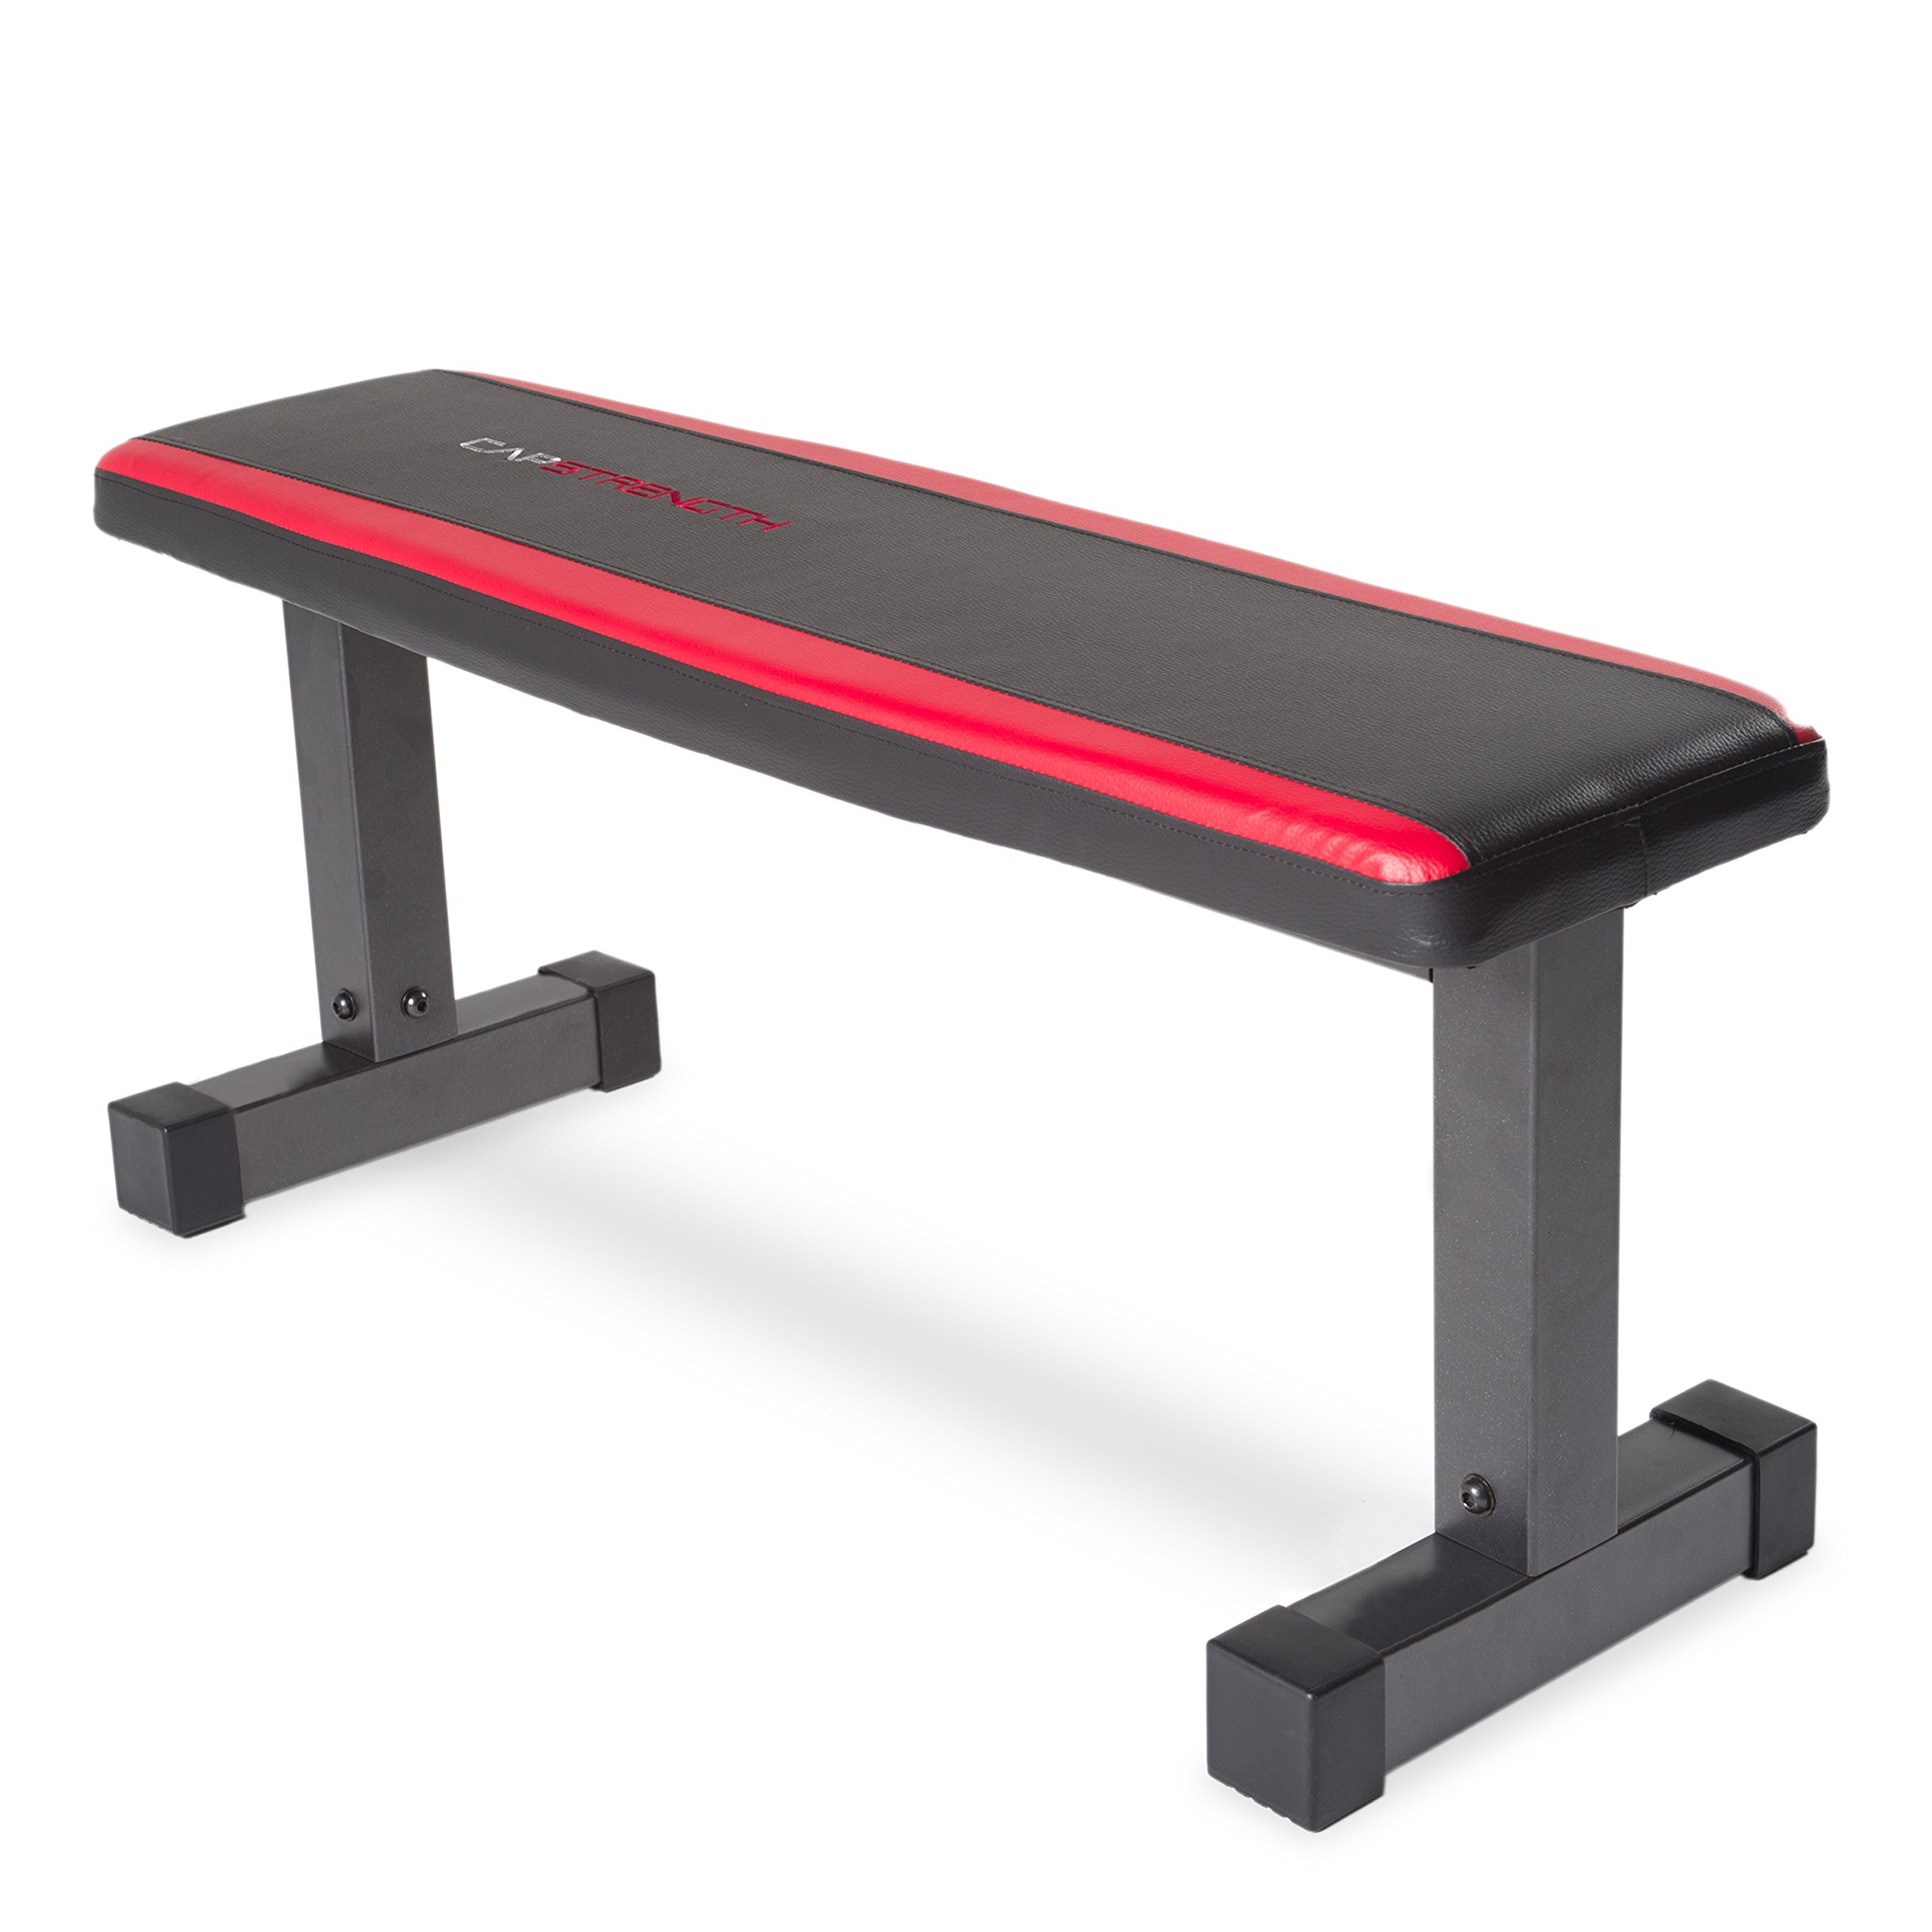 CAP Barbell Memory Foam Flat Bench, Black/Red by CAP Barbell